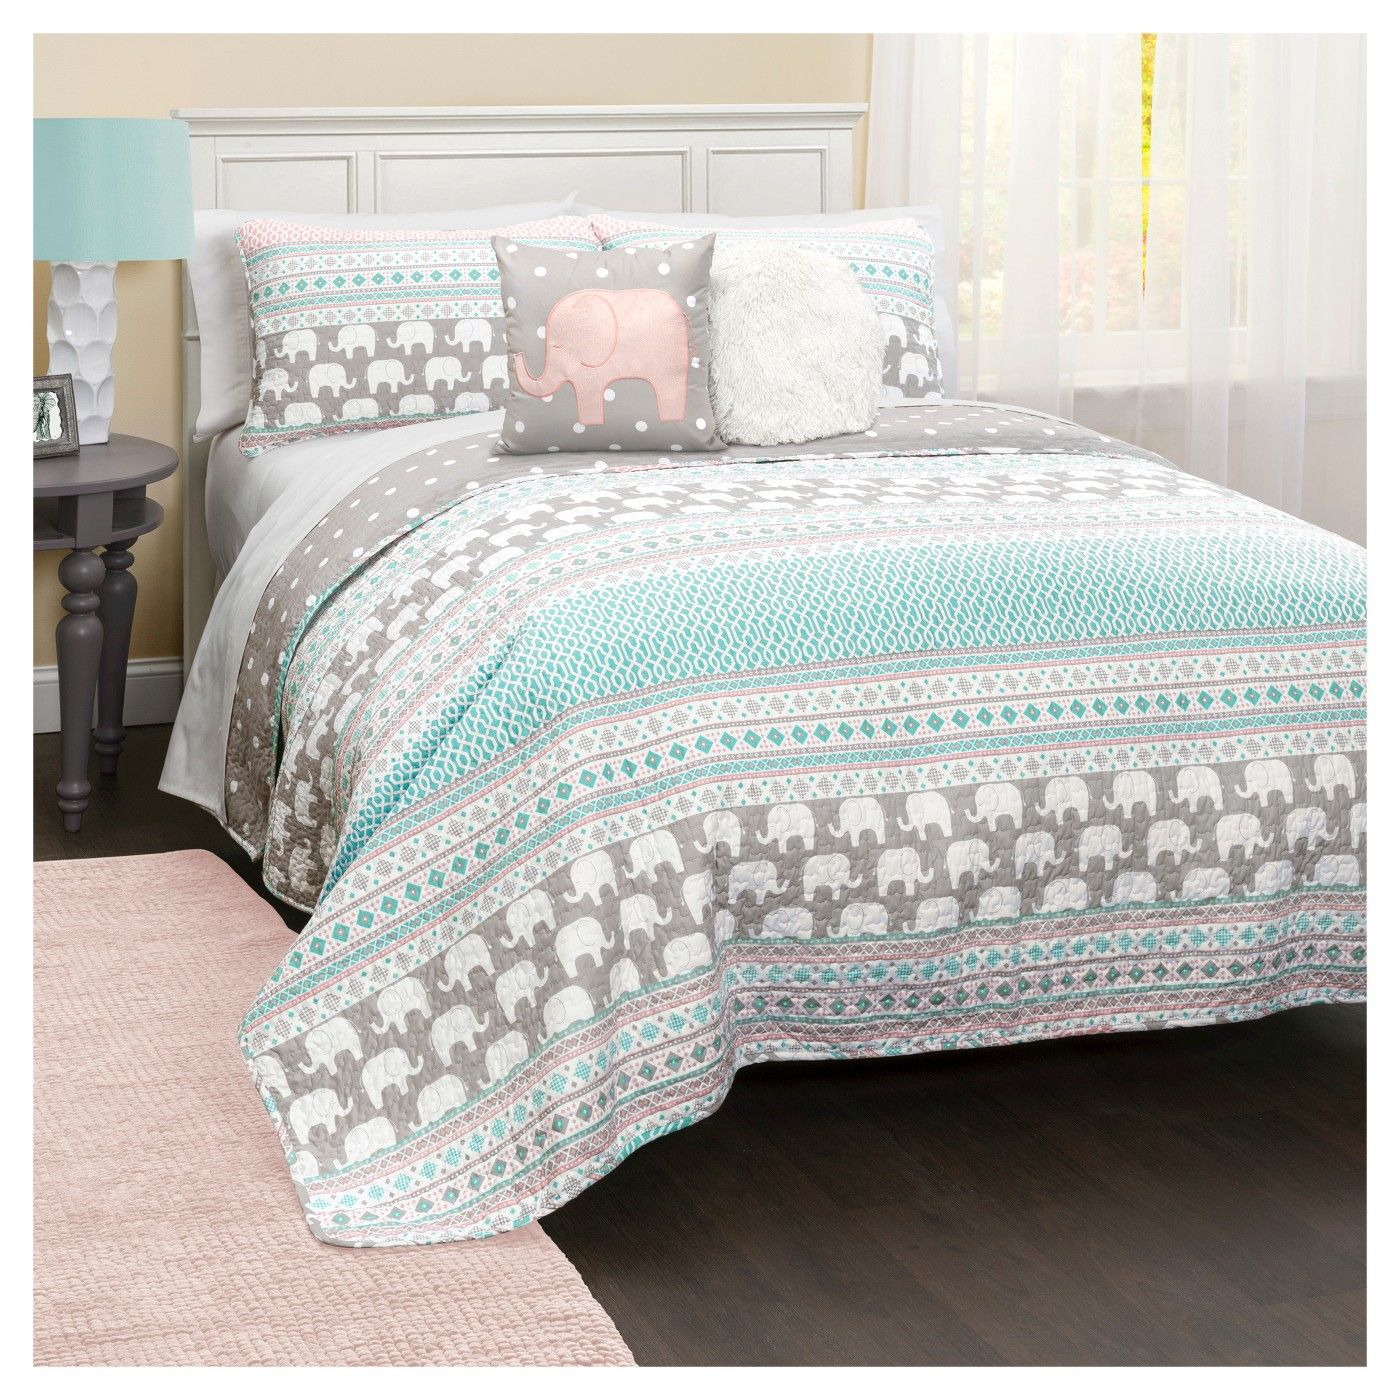 Elephant Stripe Quilt Bedding Set  Image 1 Of 8